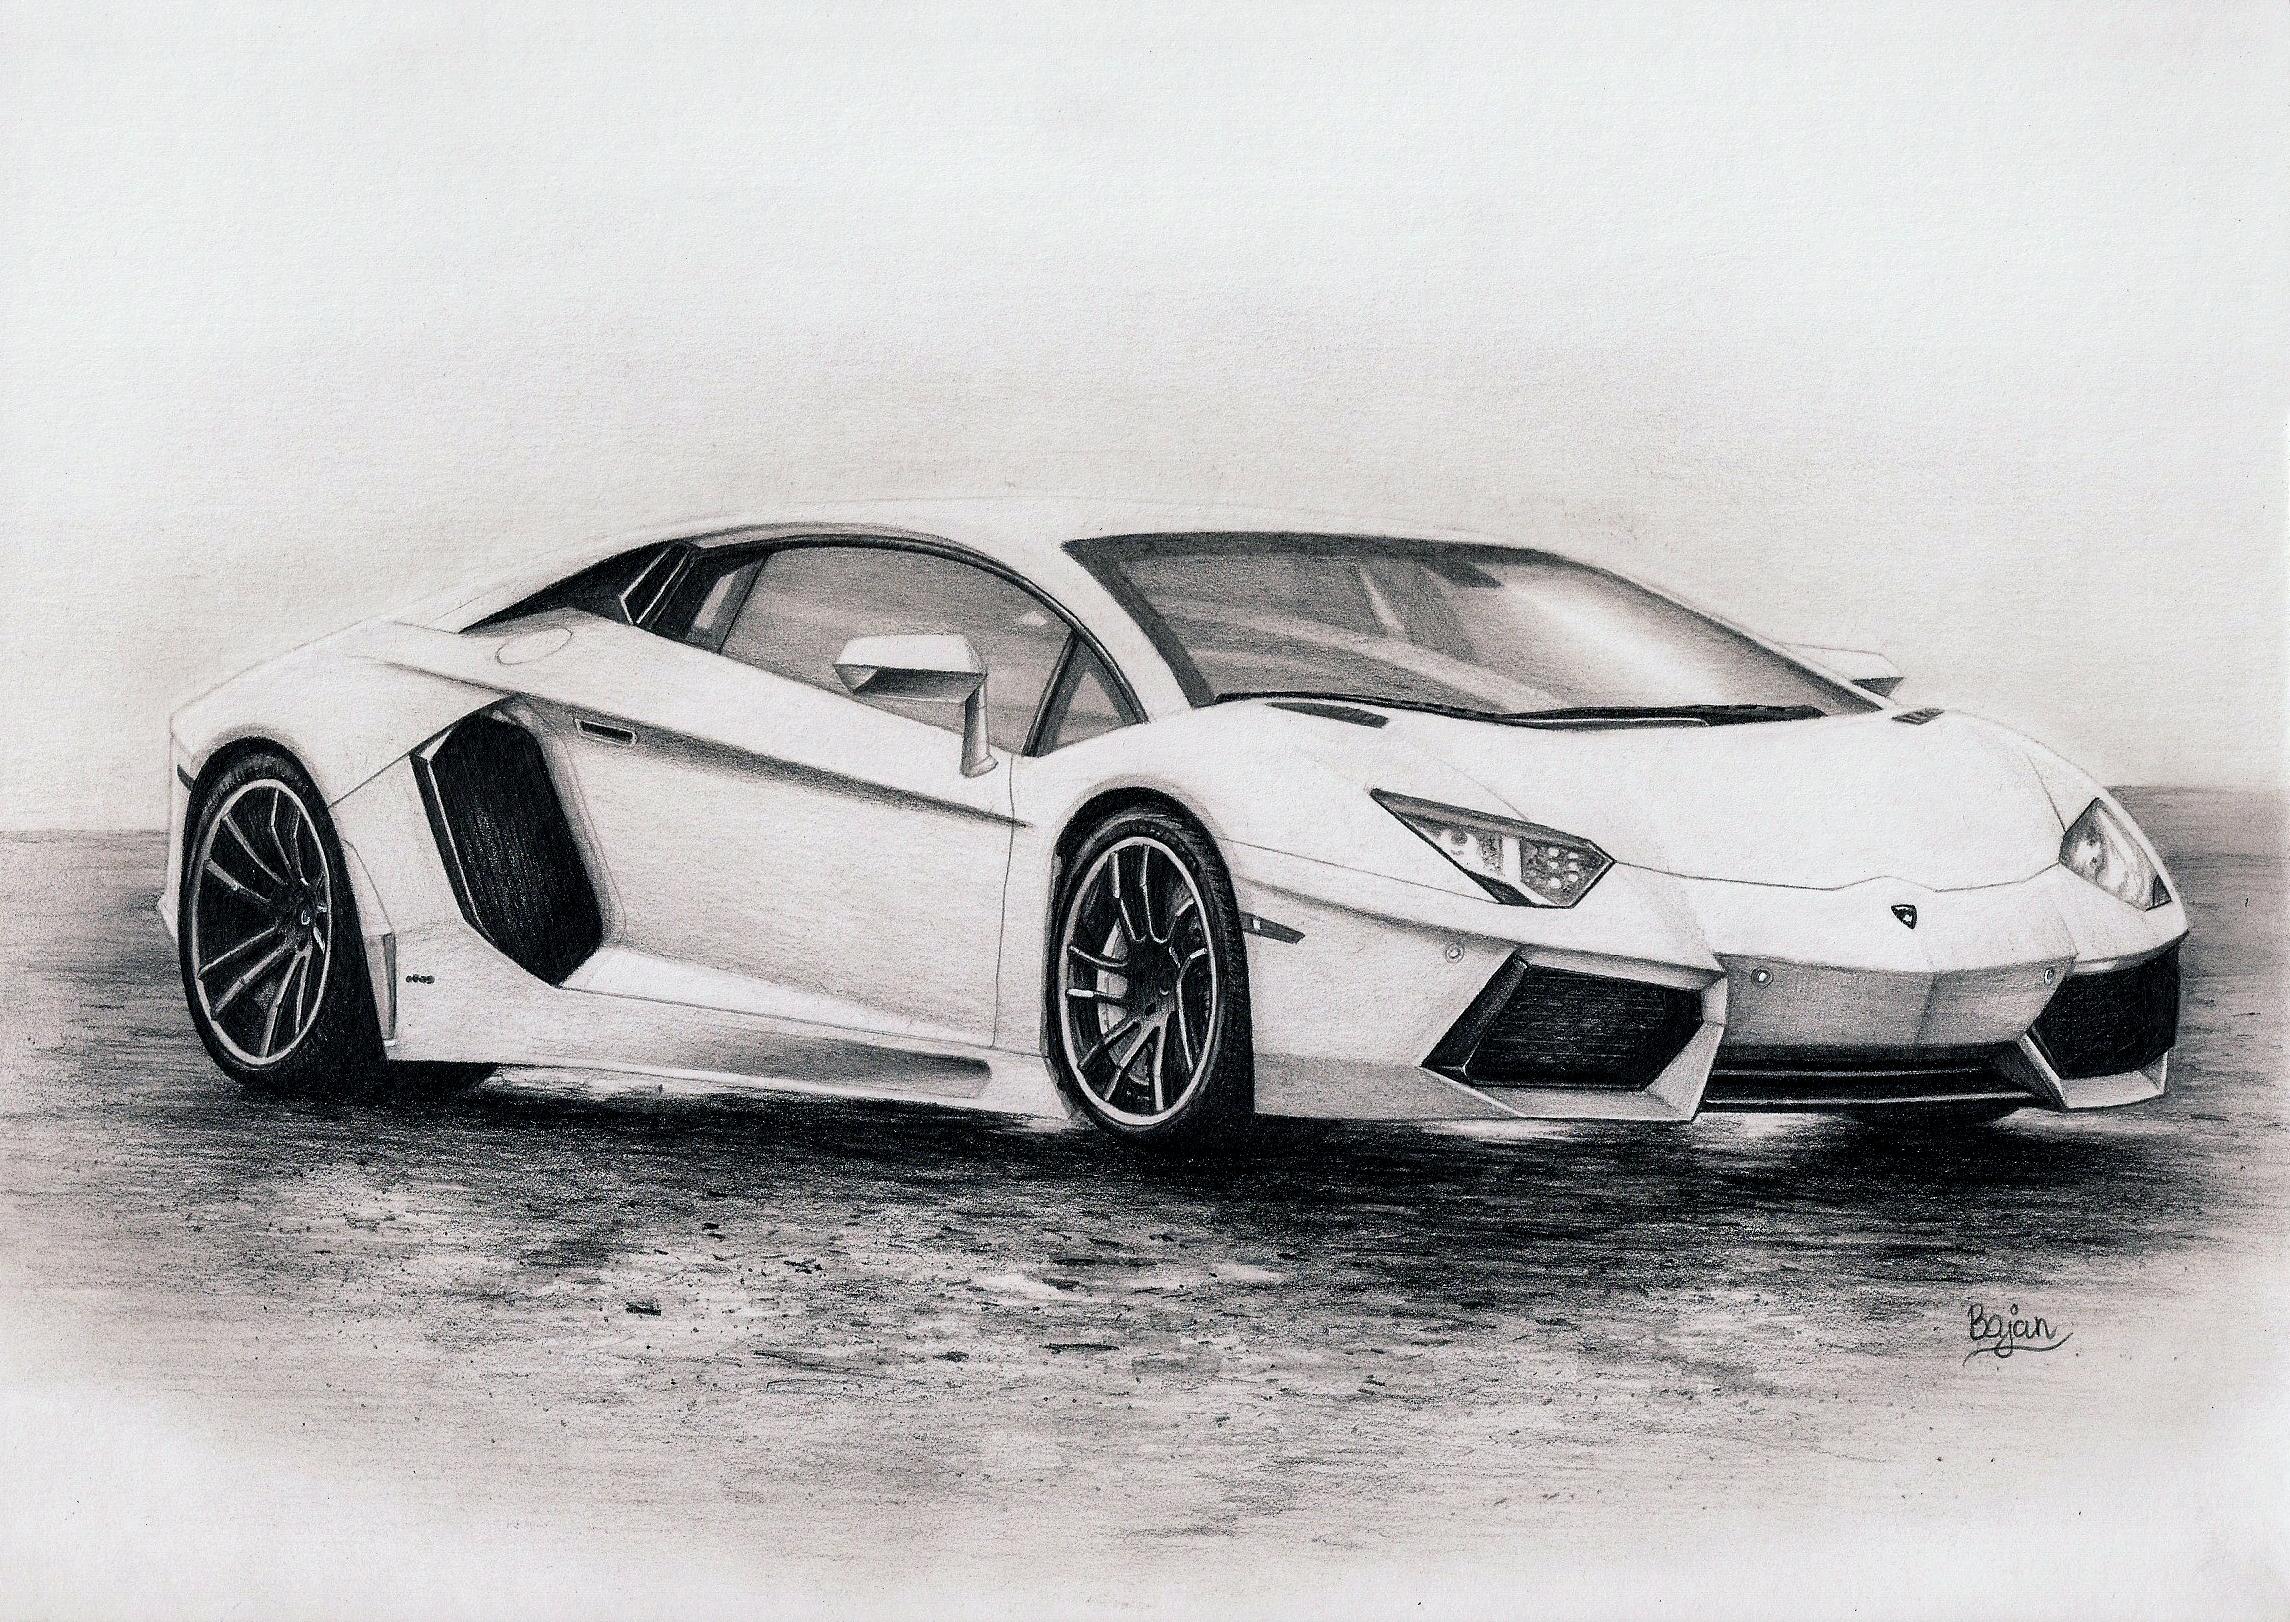 Drawn amd lamborghini aventador Drawing  on DeviantArt by